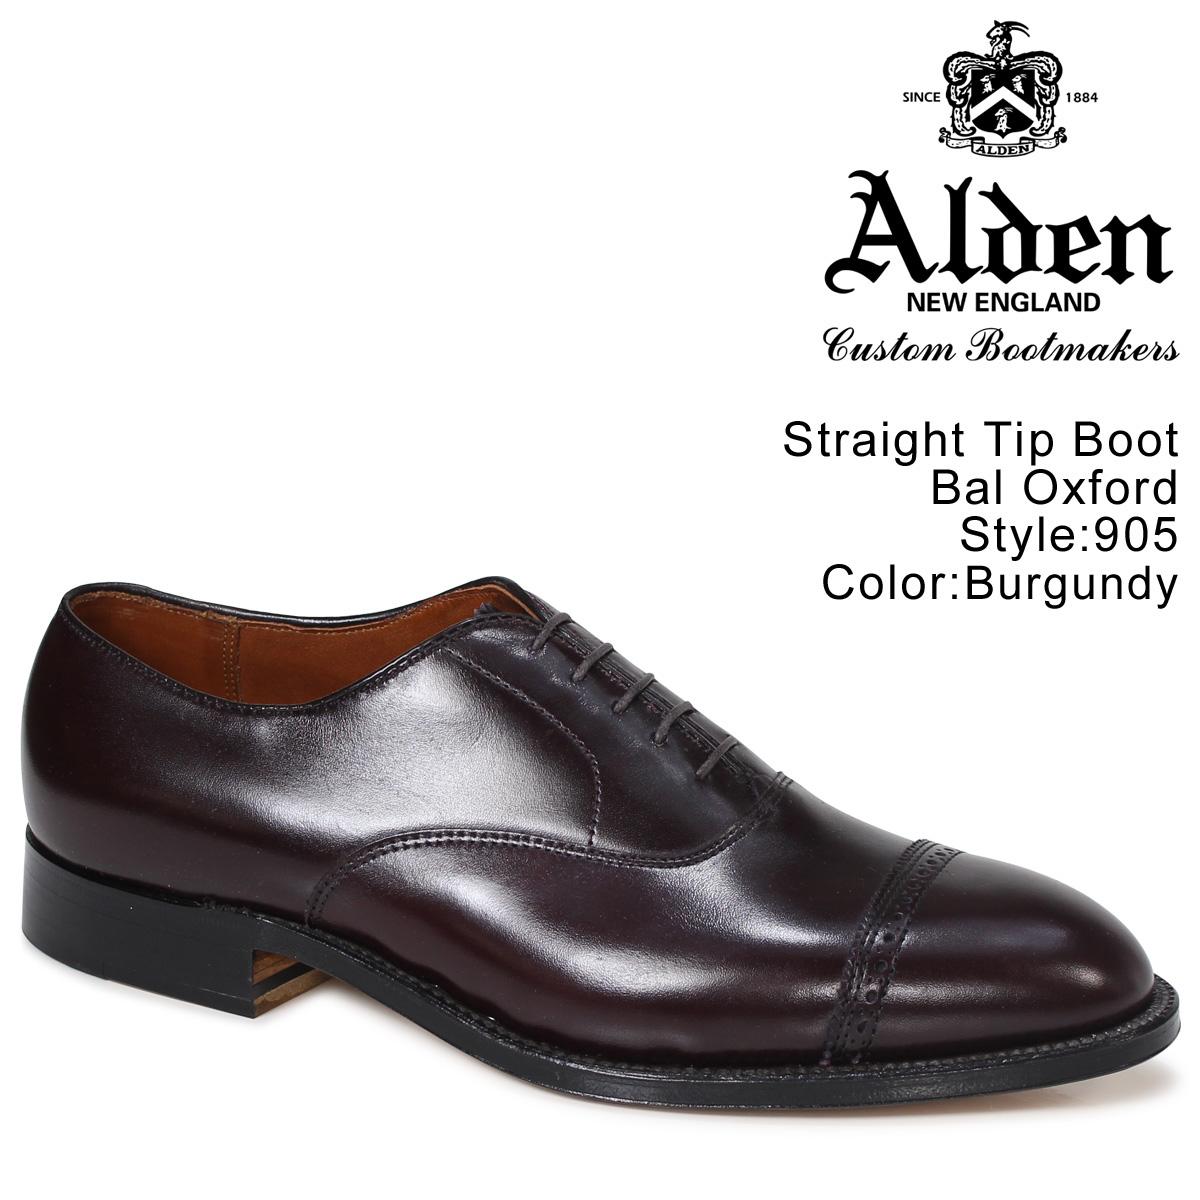 ALDEN STRAIGHT TIP BAL OXFORD オールデン オックスフォード シューズ メンズ Dワイズ 905